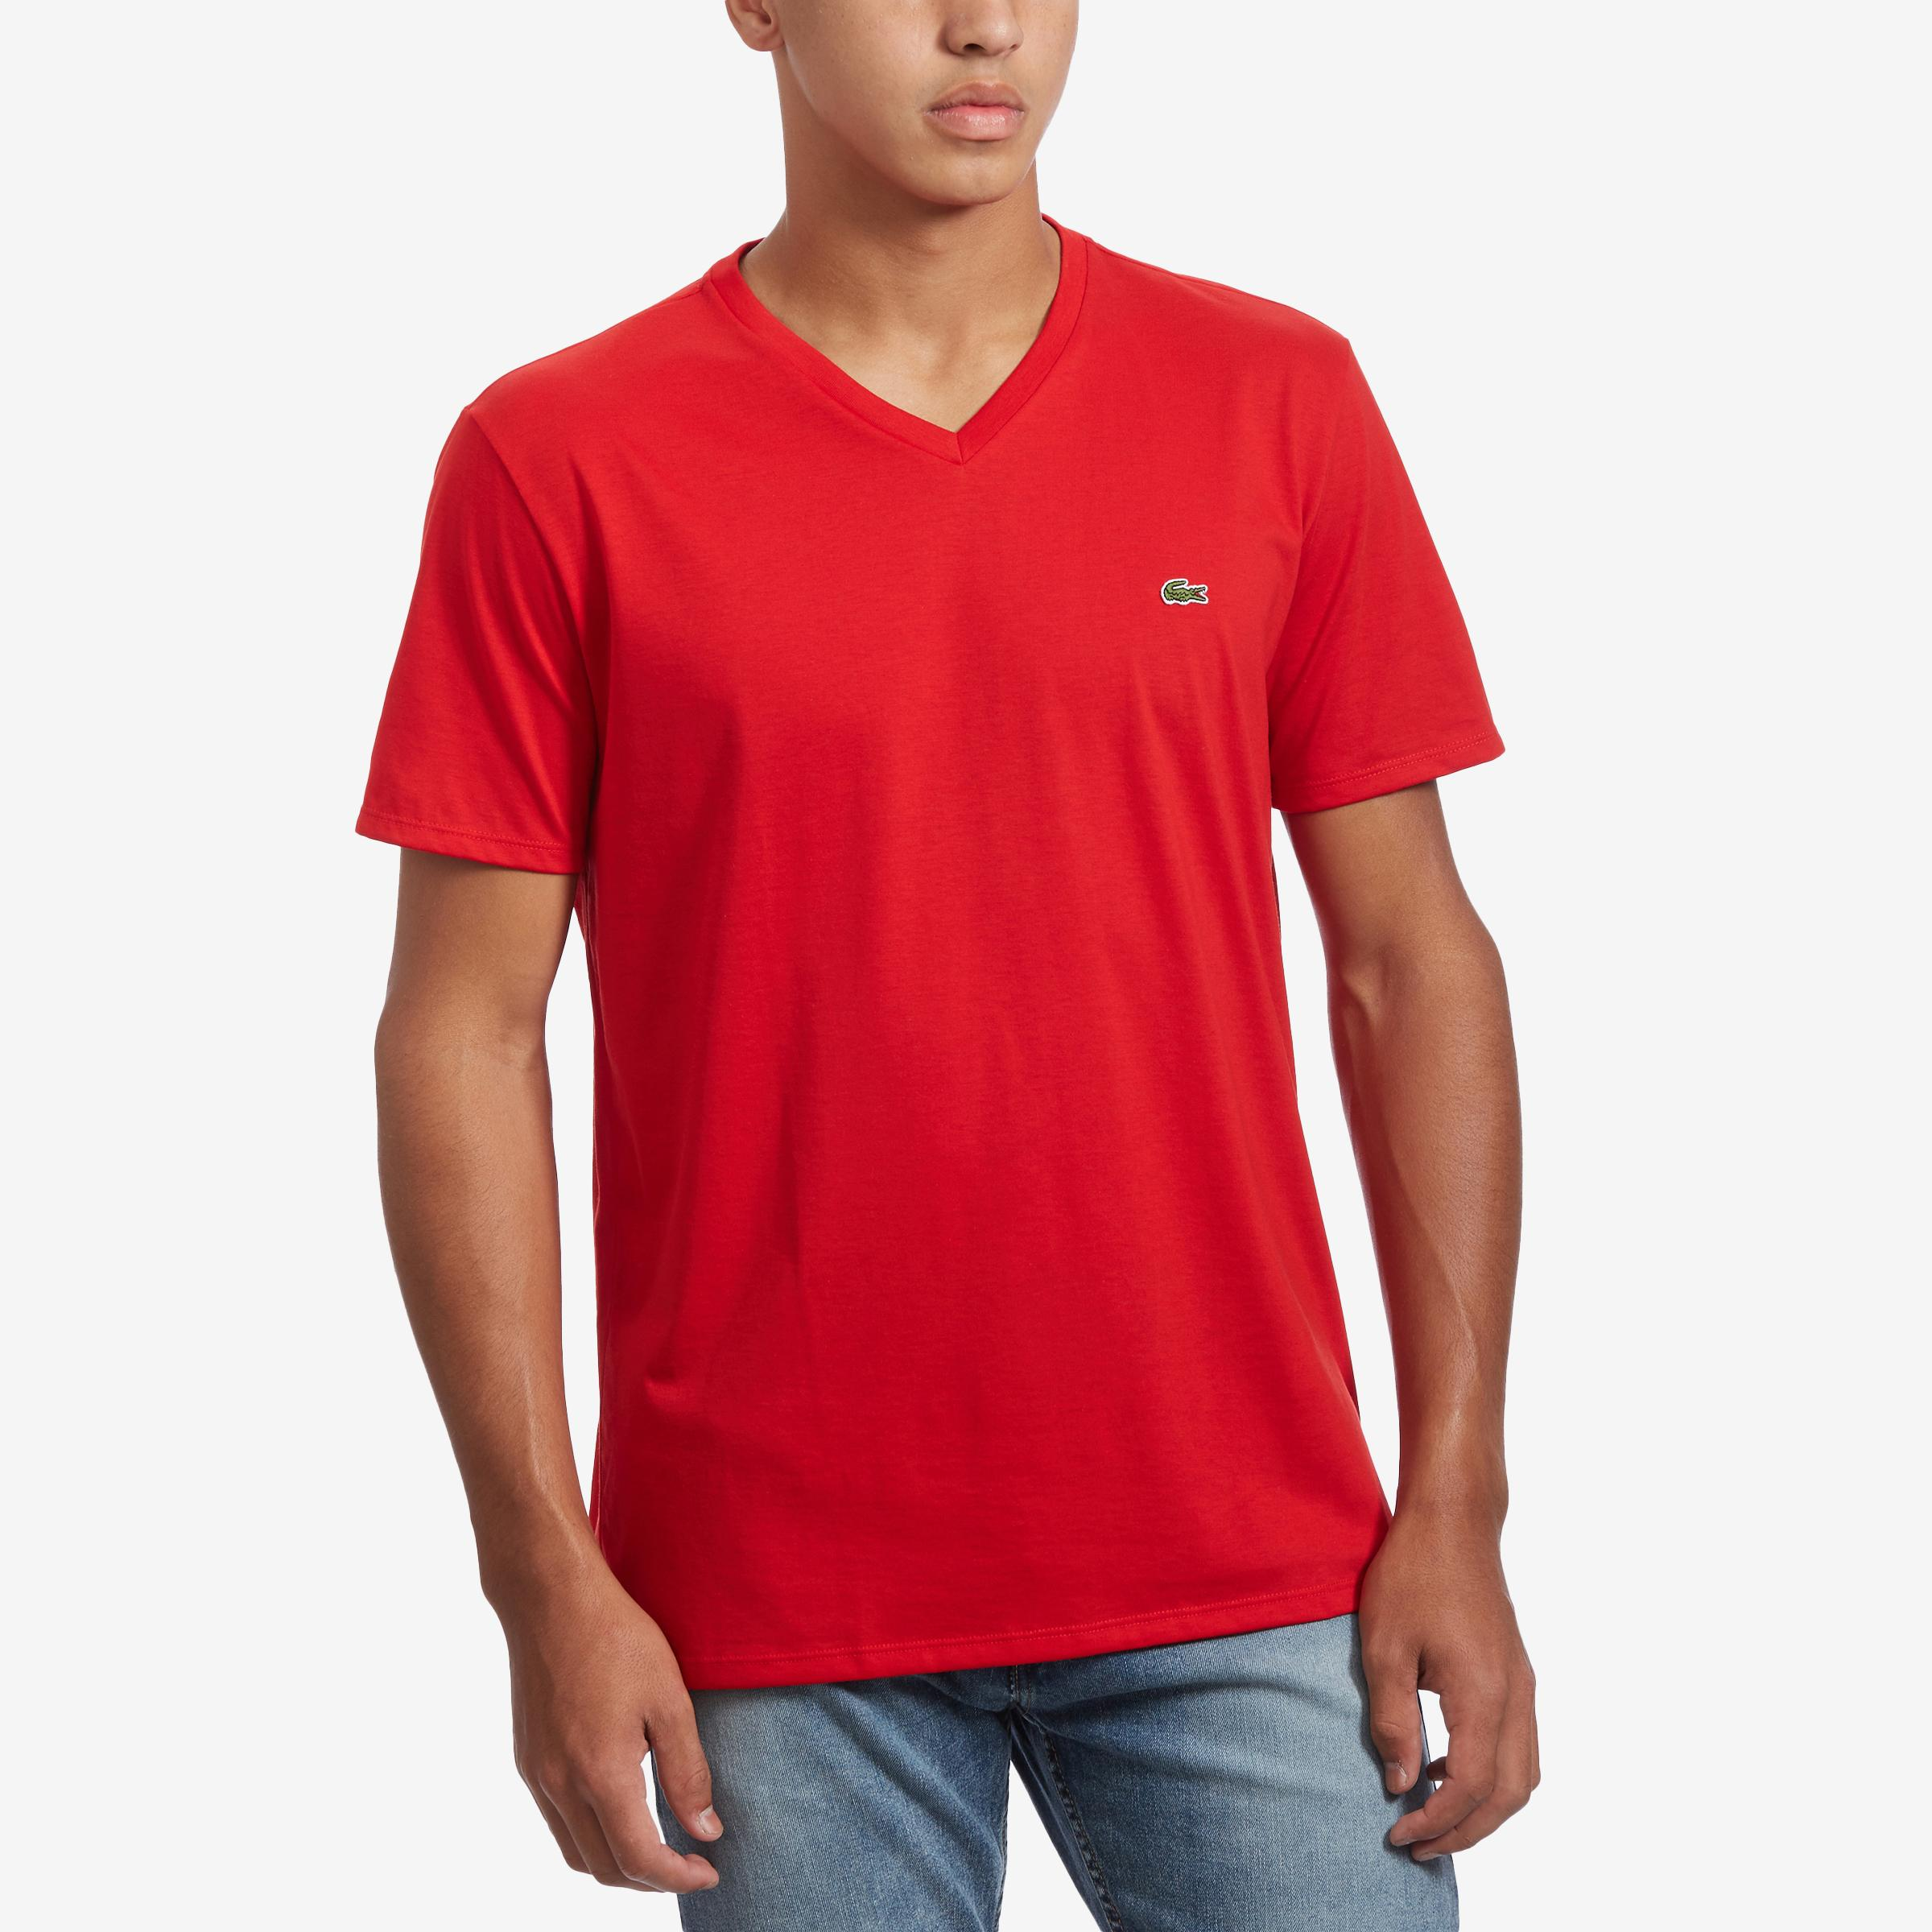 Men's V- Neck Pima Cotton Jersey T- Shirt